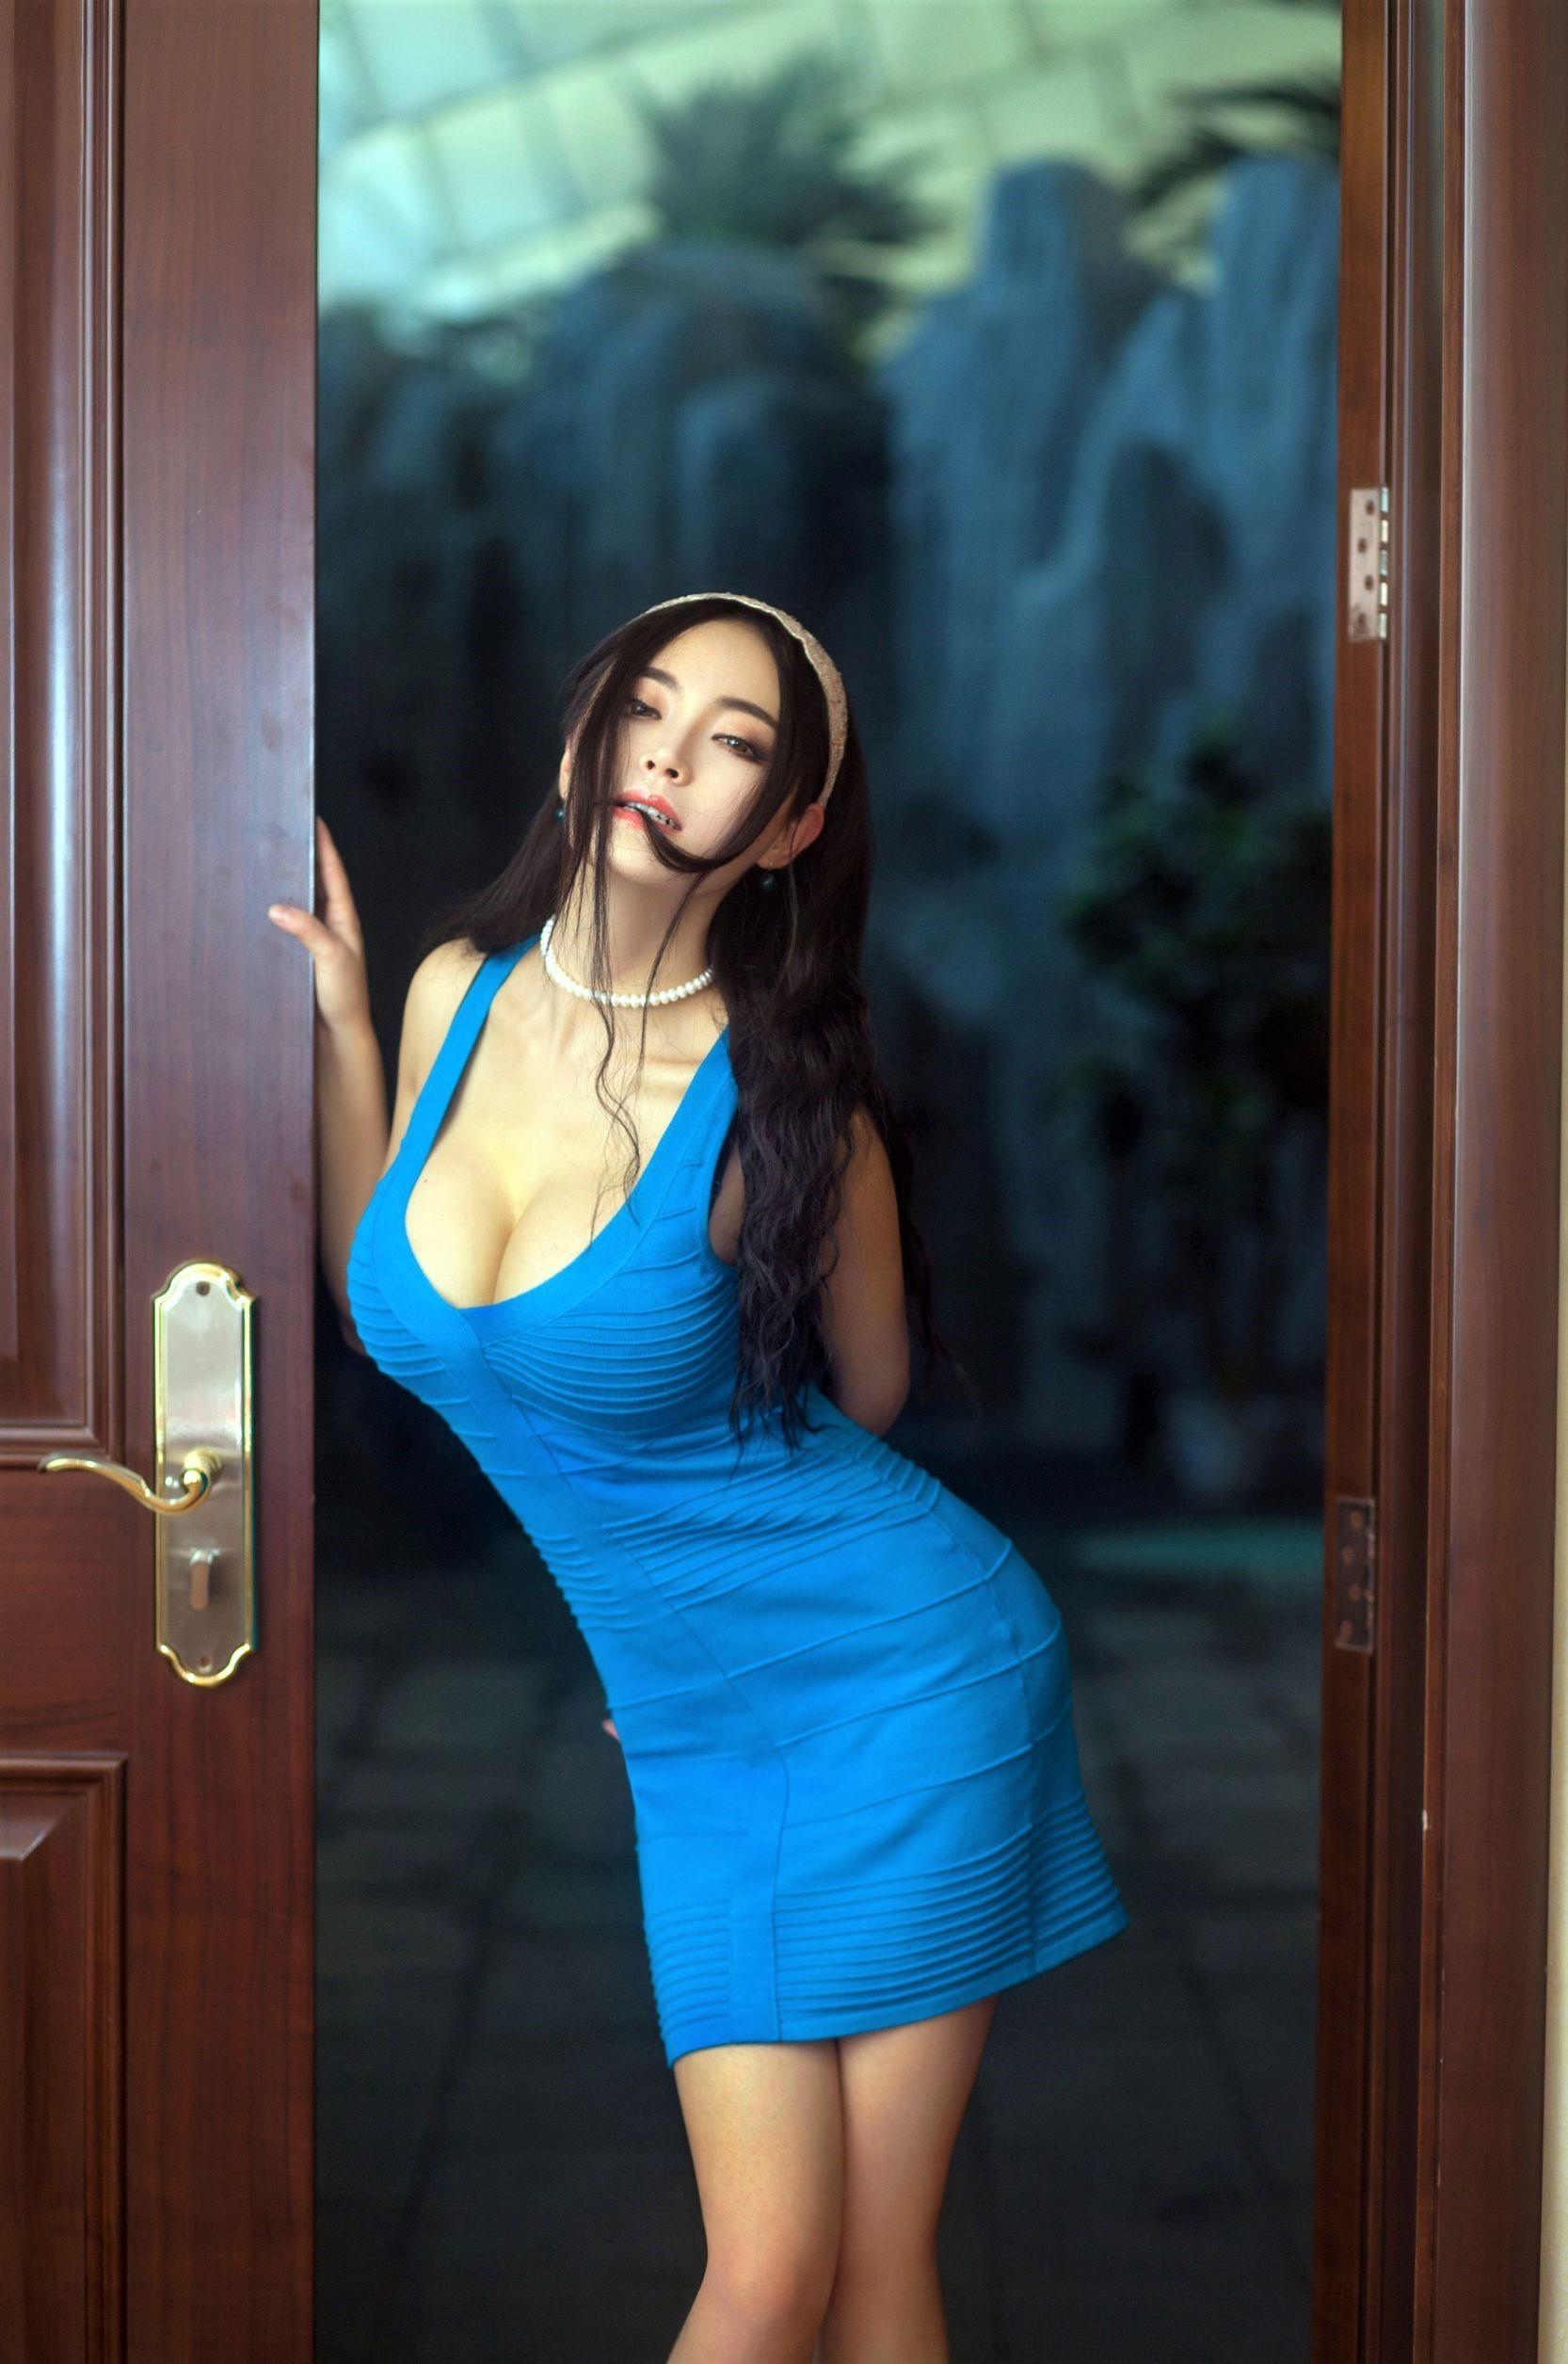 Wallpaper : Asian, big boobs, cleavage, curvy, hairband